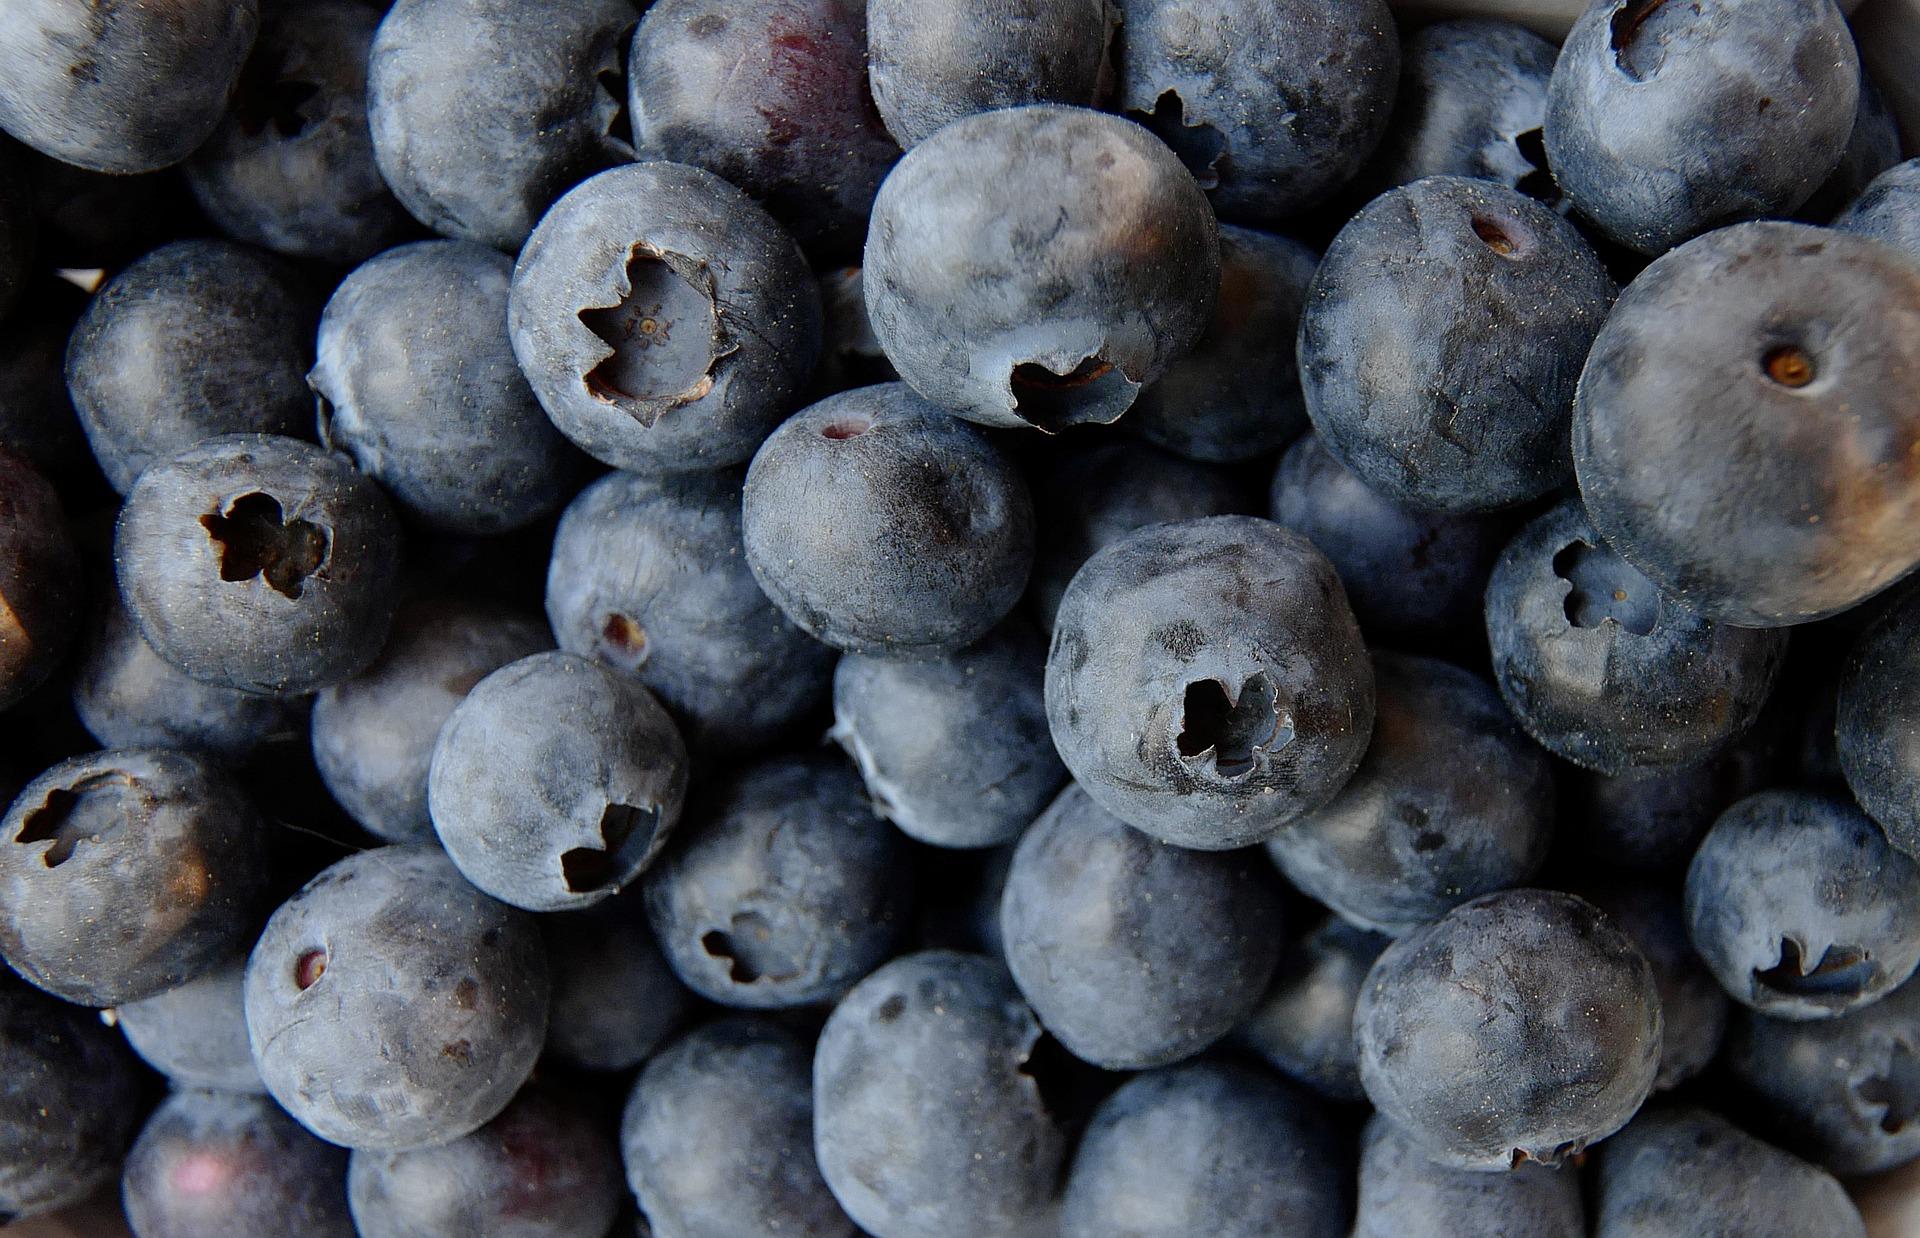 blueberry-3357568_1920.jpg